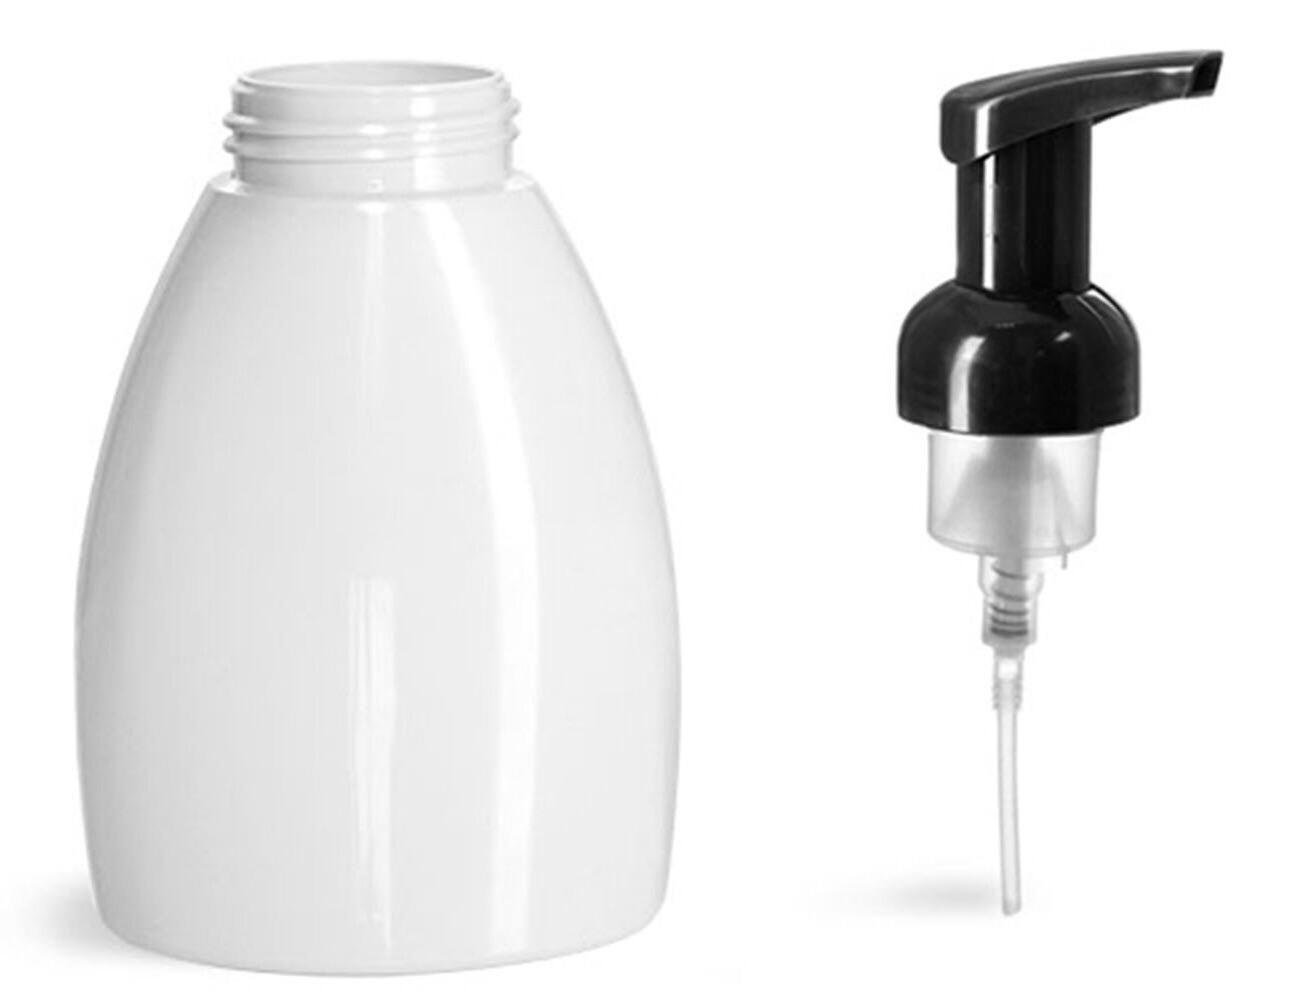 3 empty plastic white bottles with black